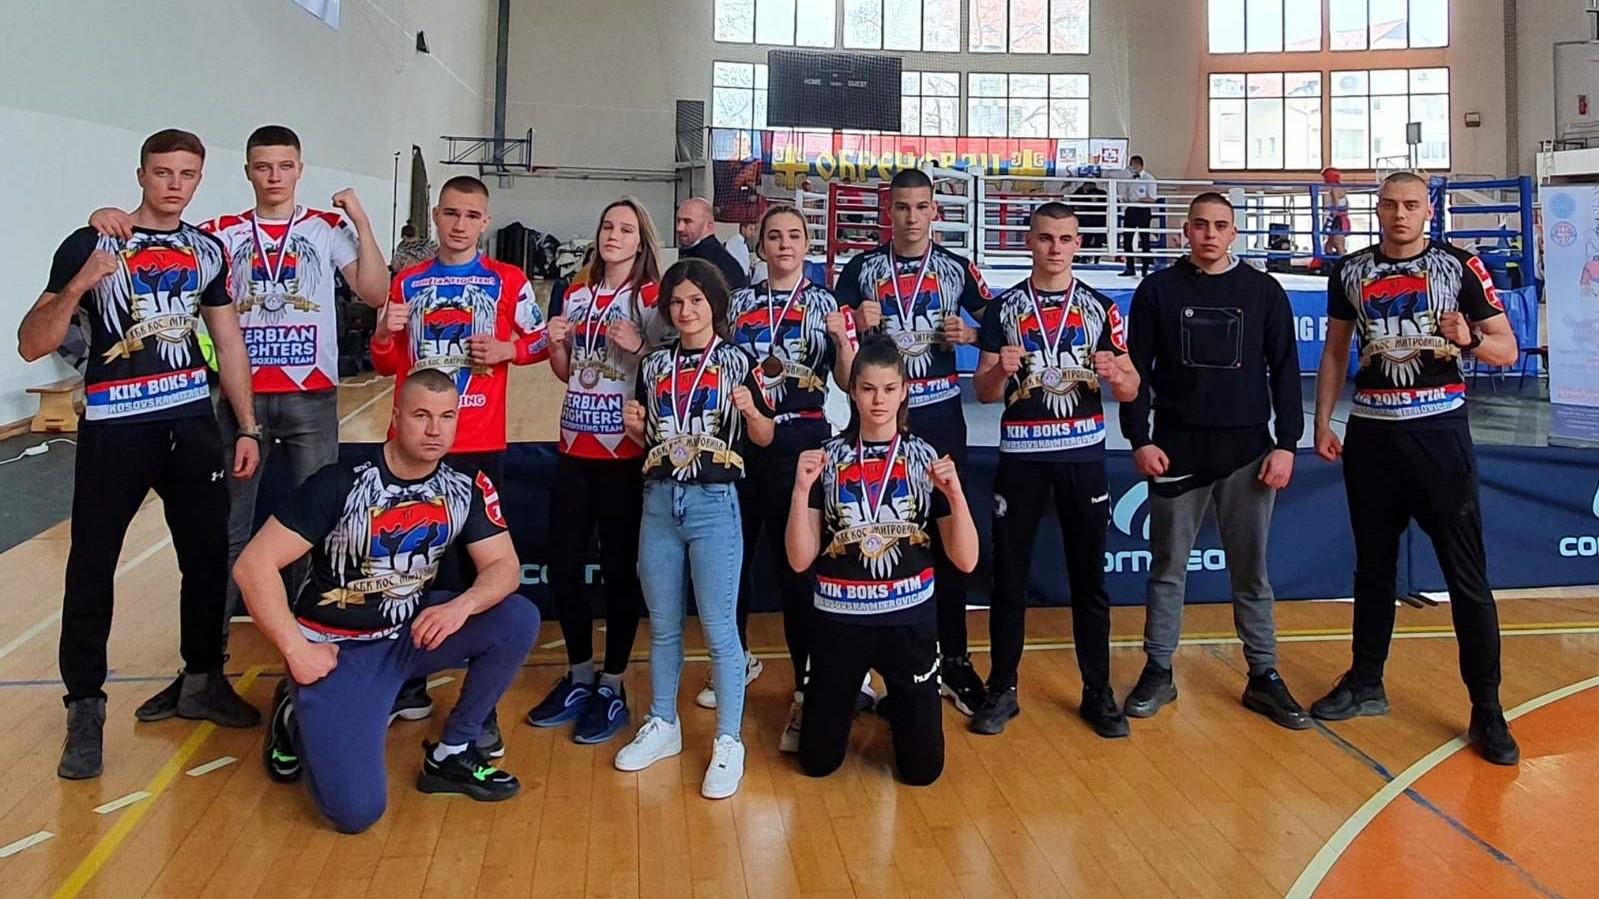 kbk-kosovska-mitrovica-silovito-i-u-obrenovcu-osvojeno-sedam-medalja